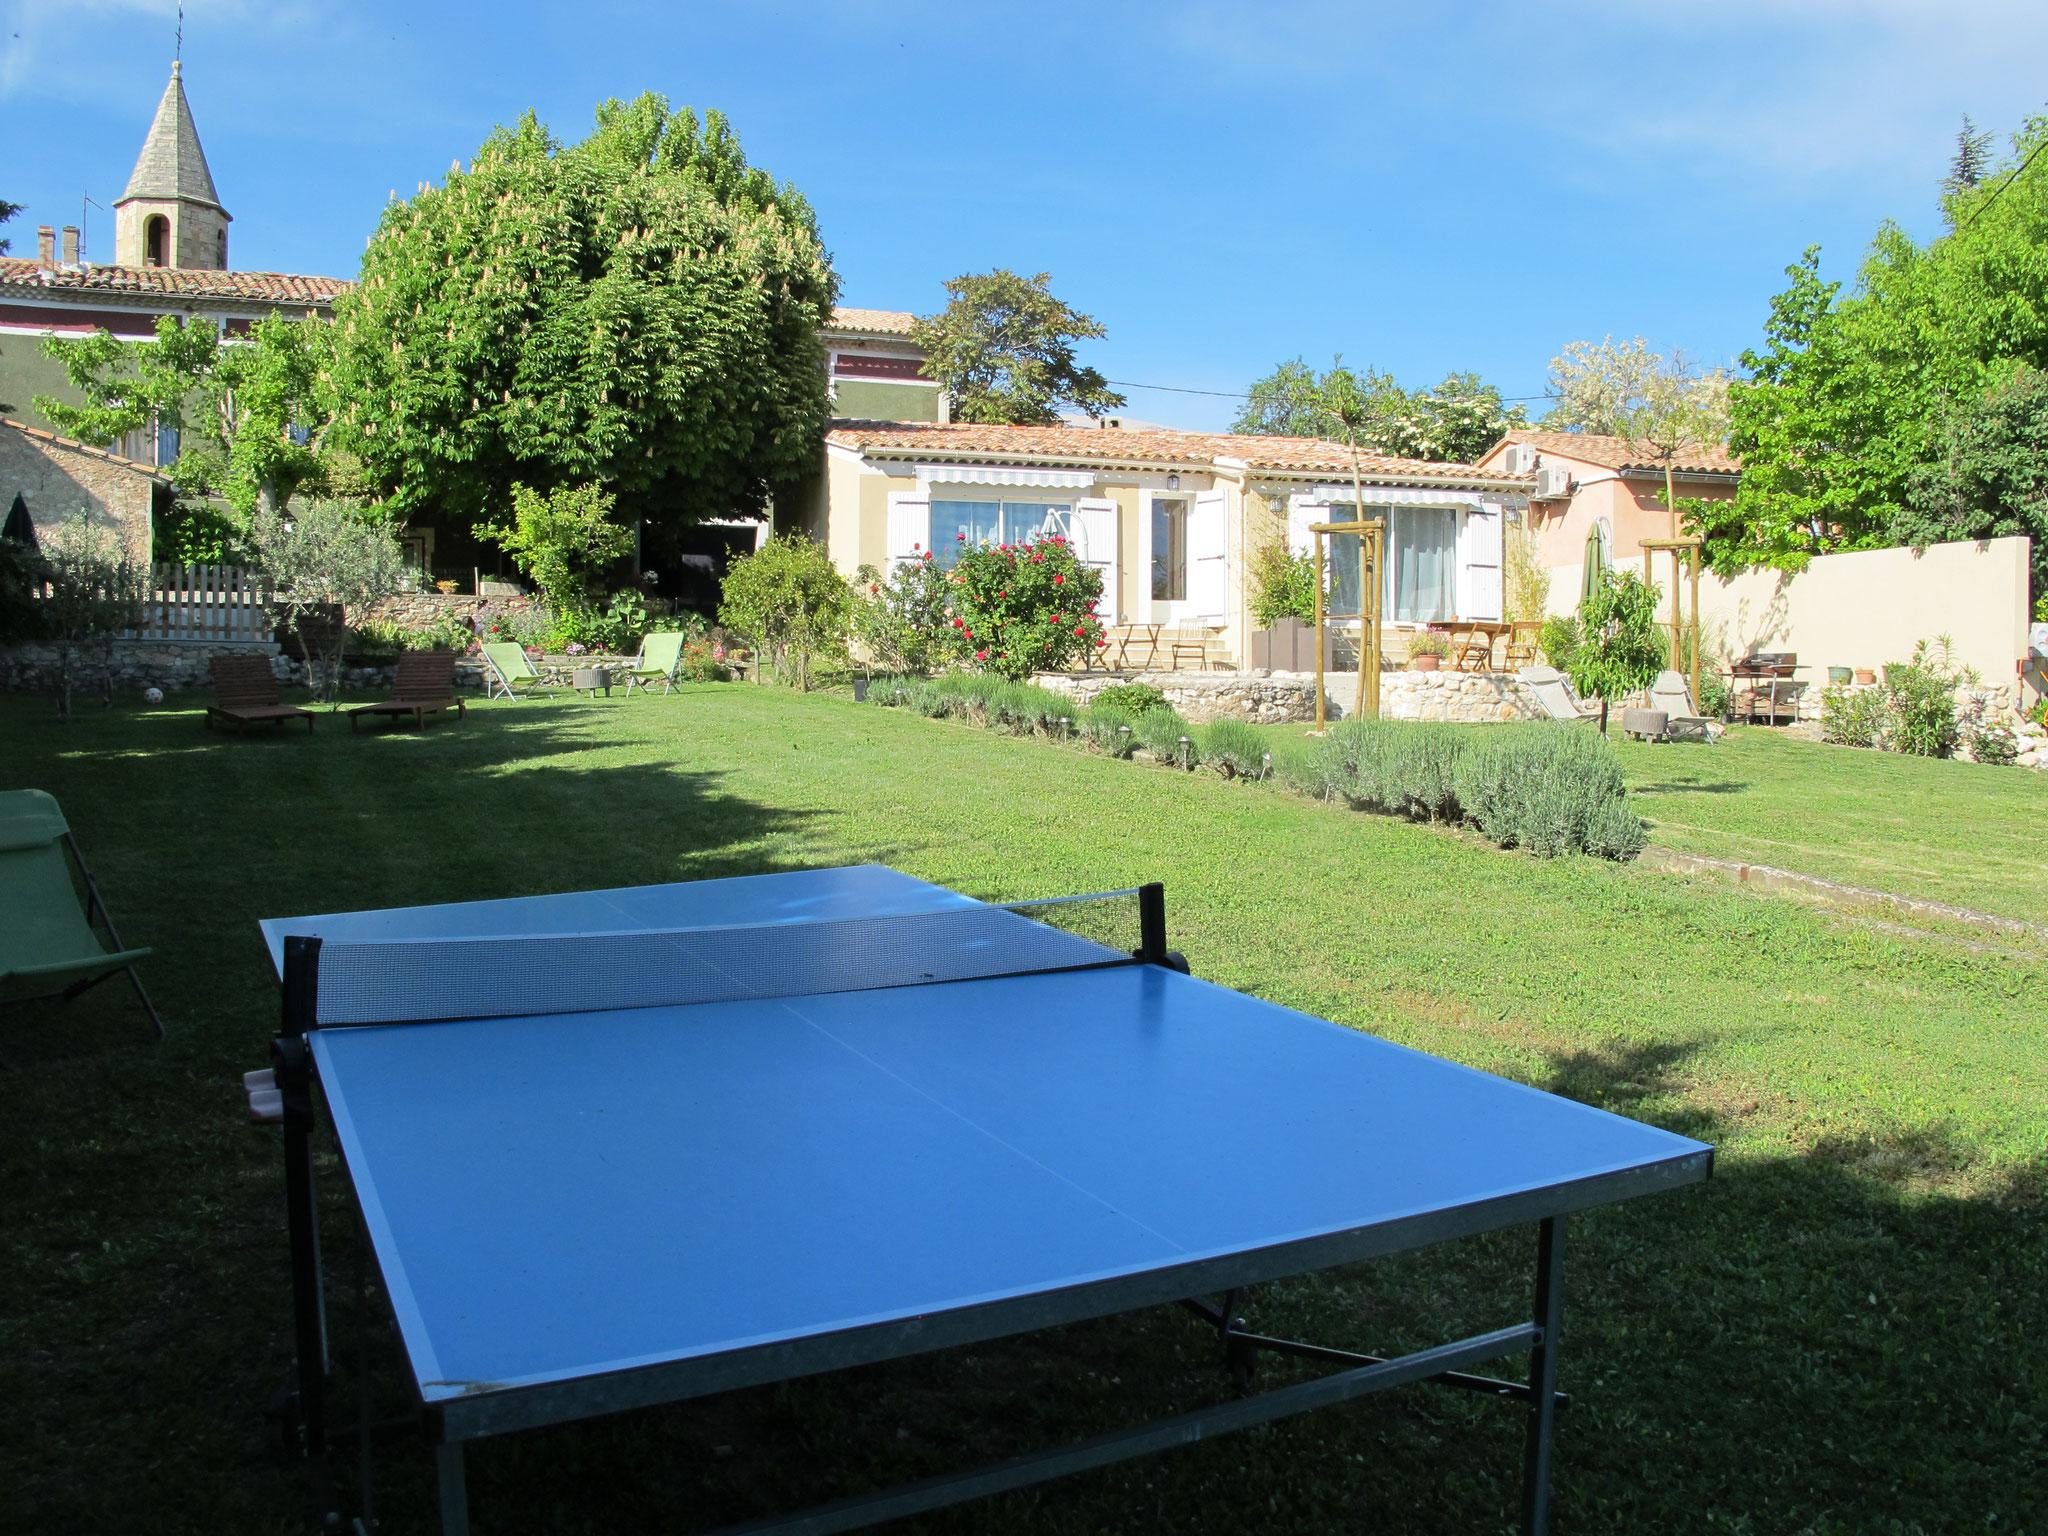 loucardaline-bedoin-ventoux-chambre d hotes-vaucluse-vacances-famille-ping pong